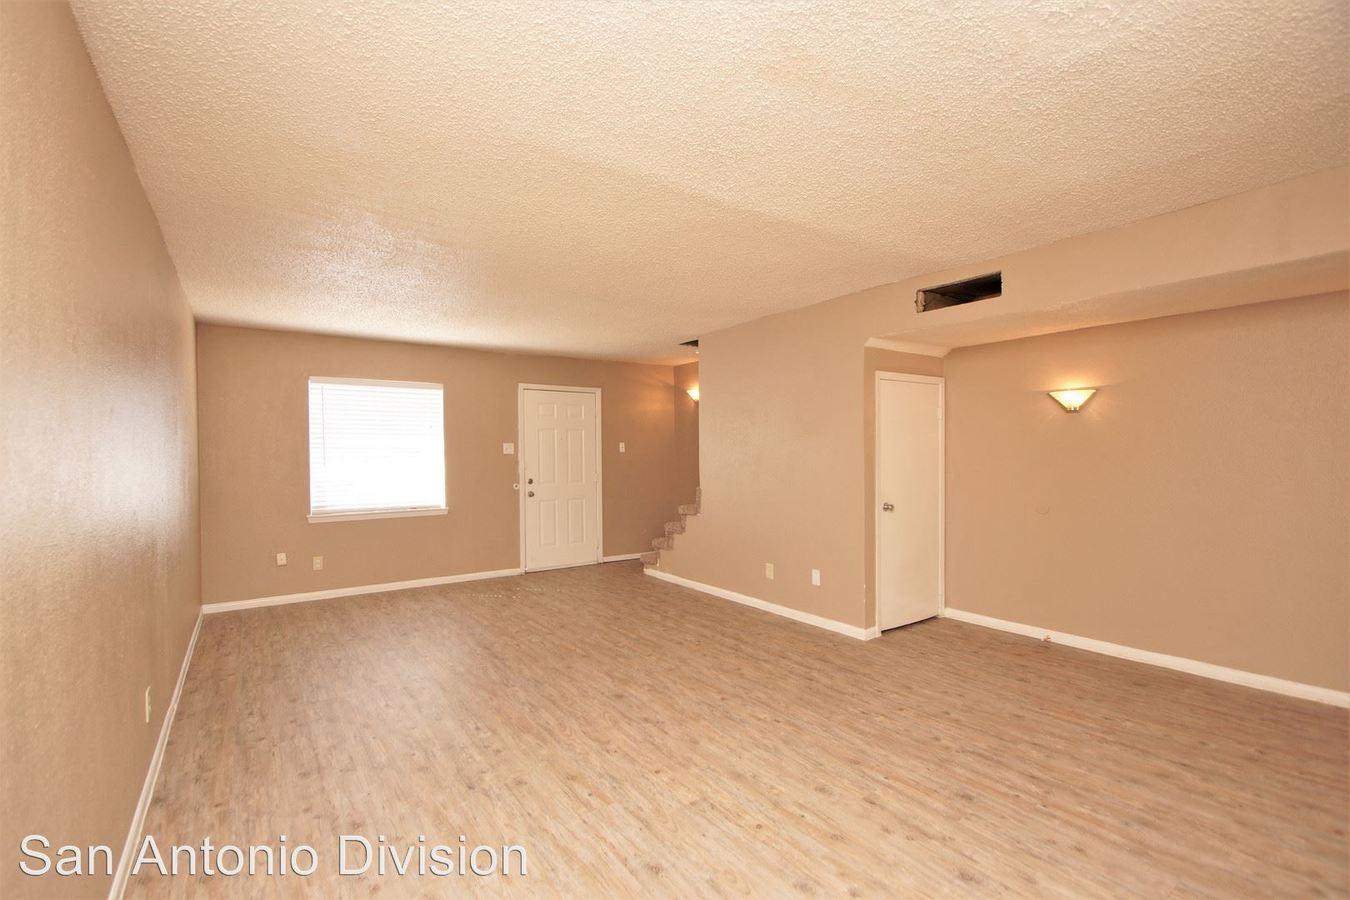 2 Bedrooms 1 Bathroom Apartment for rent at 9526 Contessa Dr. in San Antonio, TX